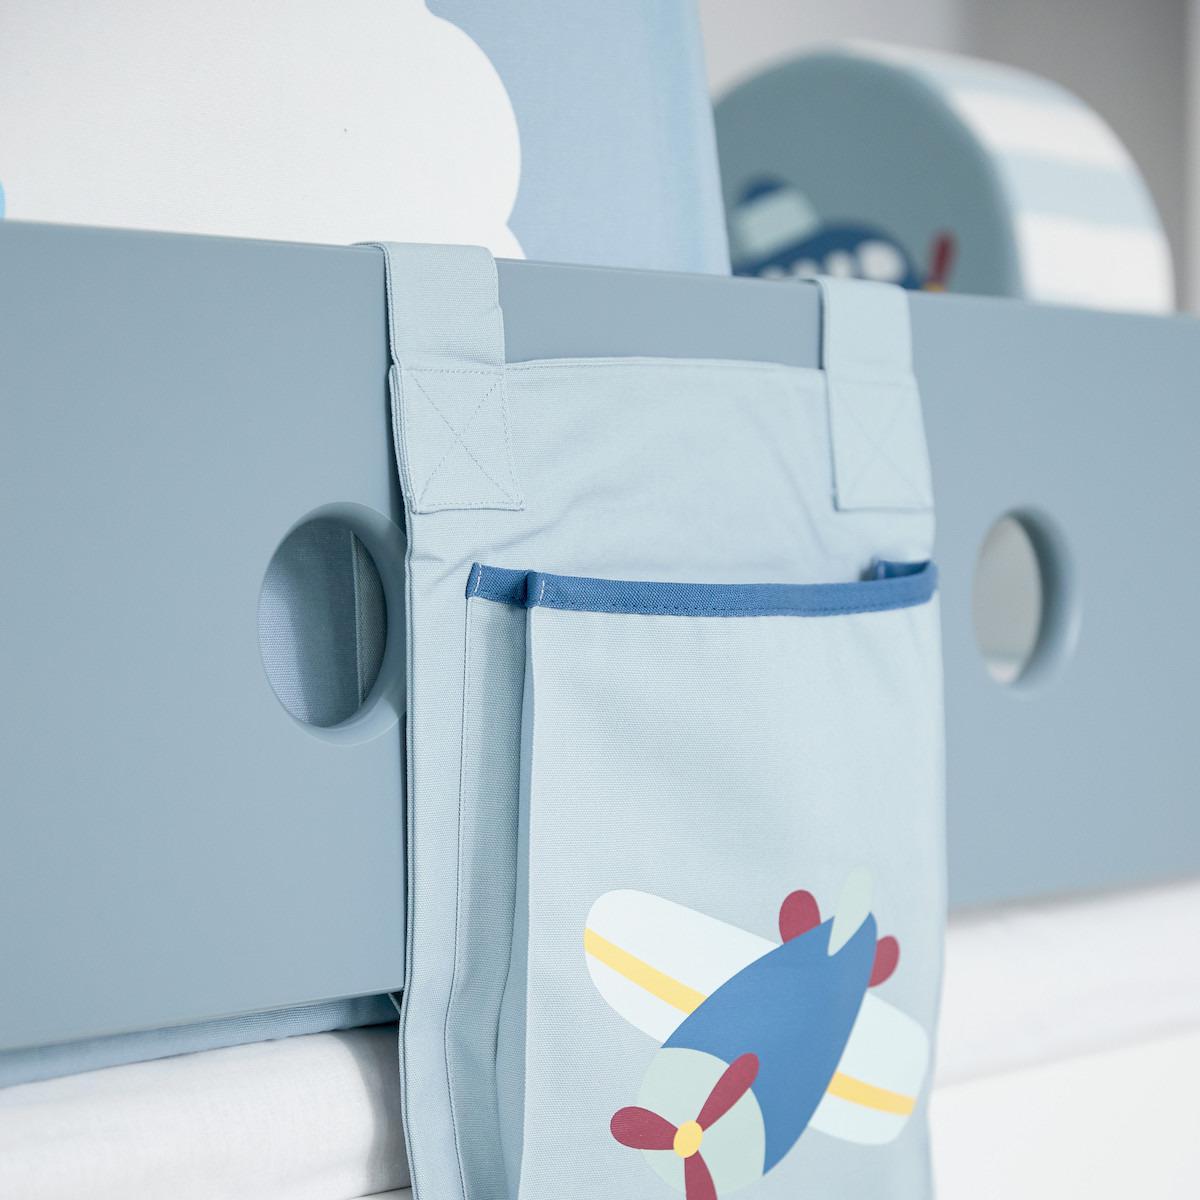 Cama media alta 90x200cm escalera inclinada WHITE Flexa blanco-azul claro